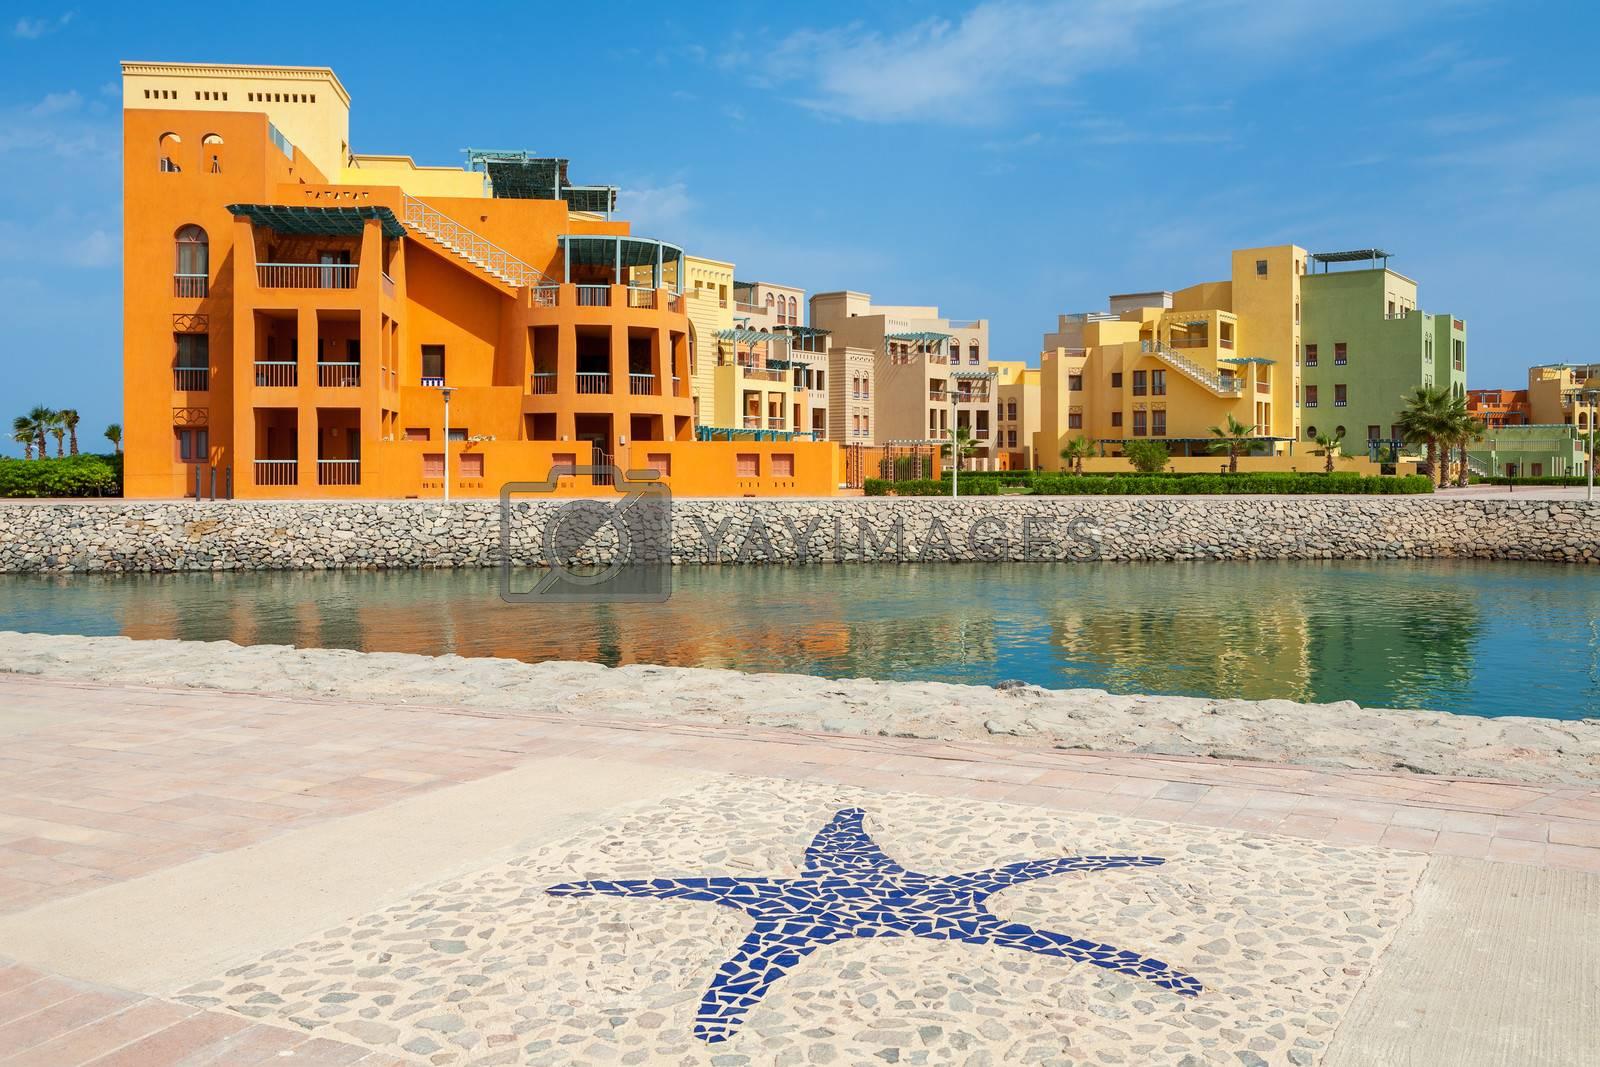 Promenade in Abu Tig Marina. El Gouna, Egypt, North Africa